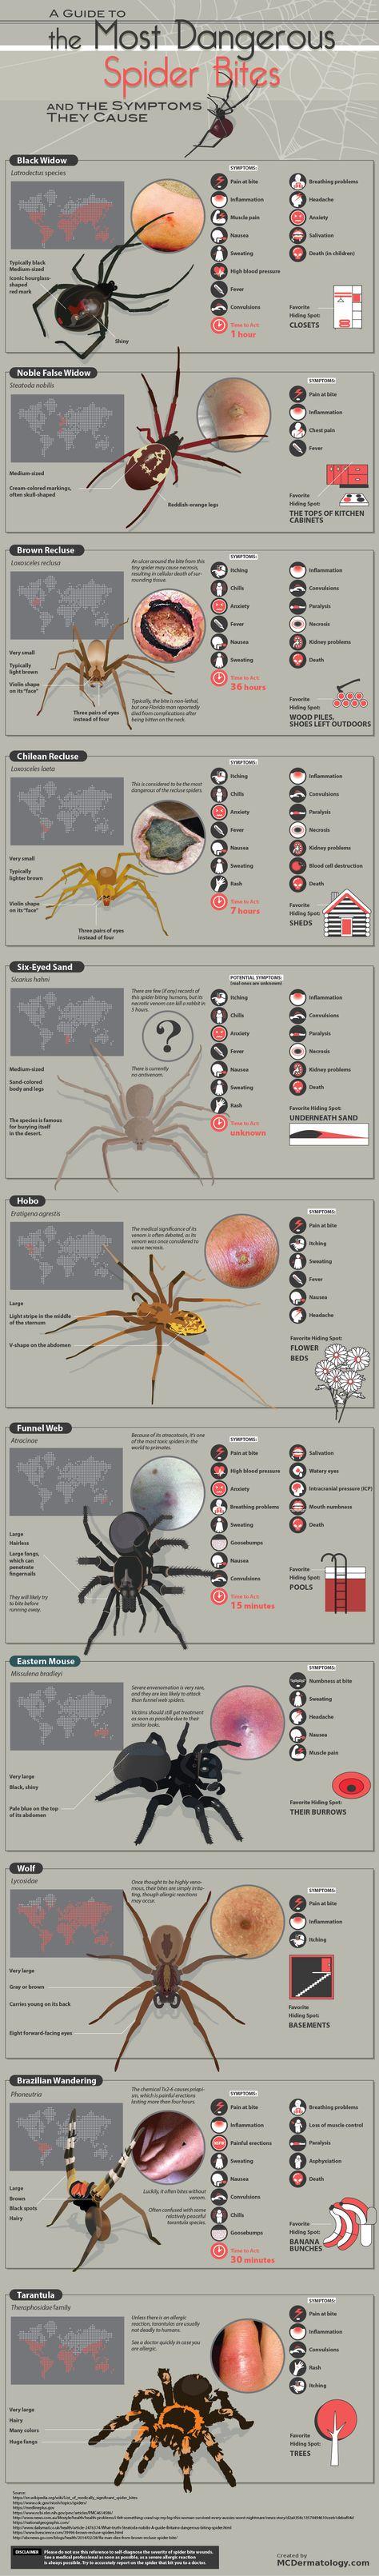 White Tail Spider | Superheroes \u0026 Supervillans | Pinterest | White ...